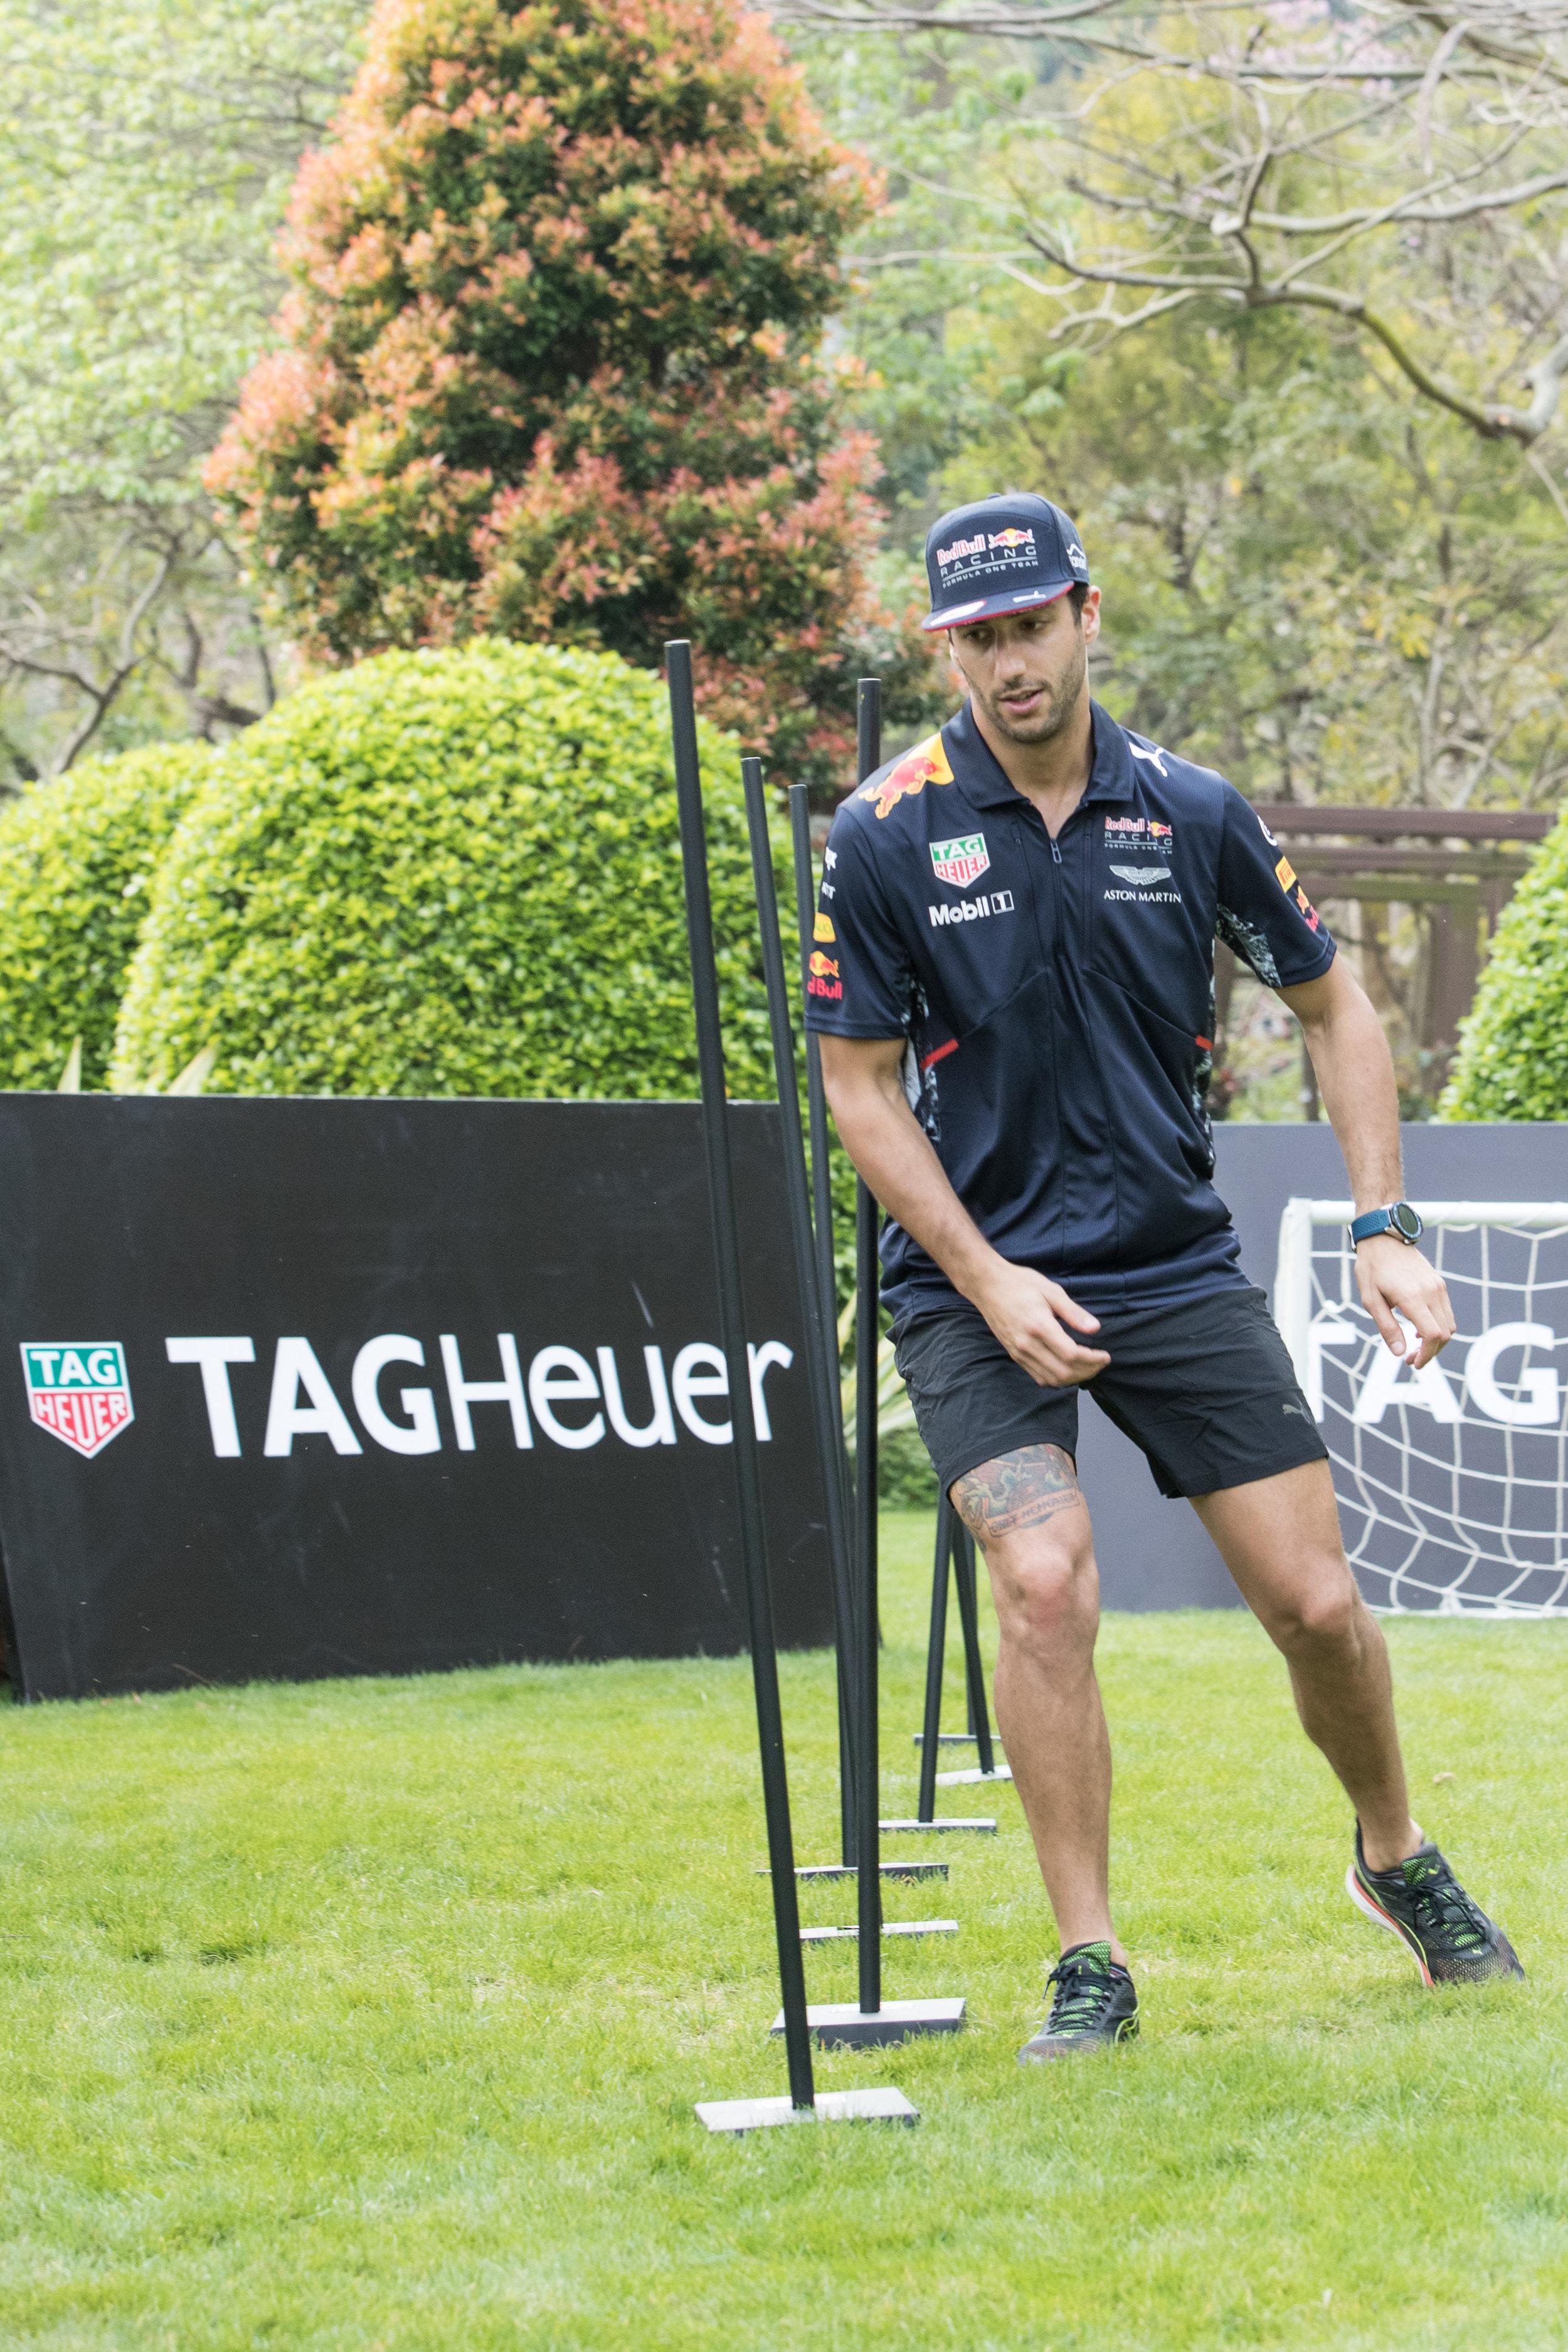 TAG Heuer. Rugby 7s Hong Kong. Daniel Ricciardo